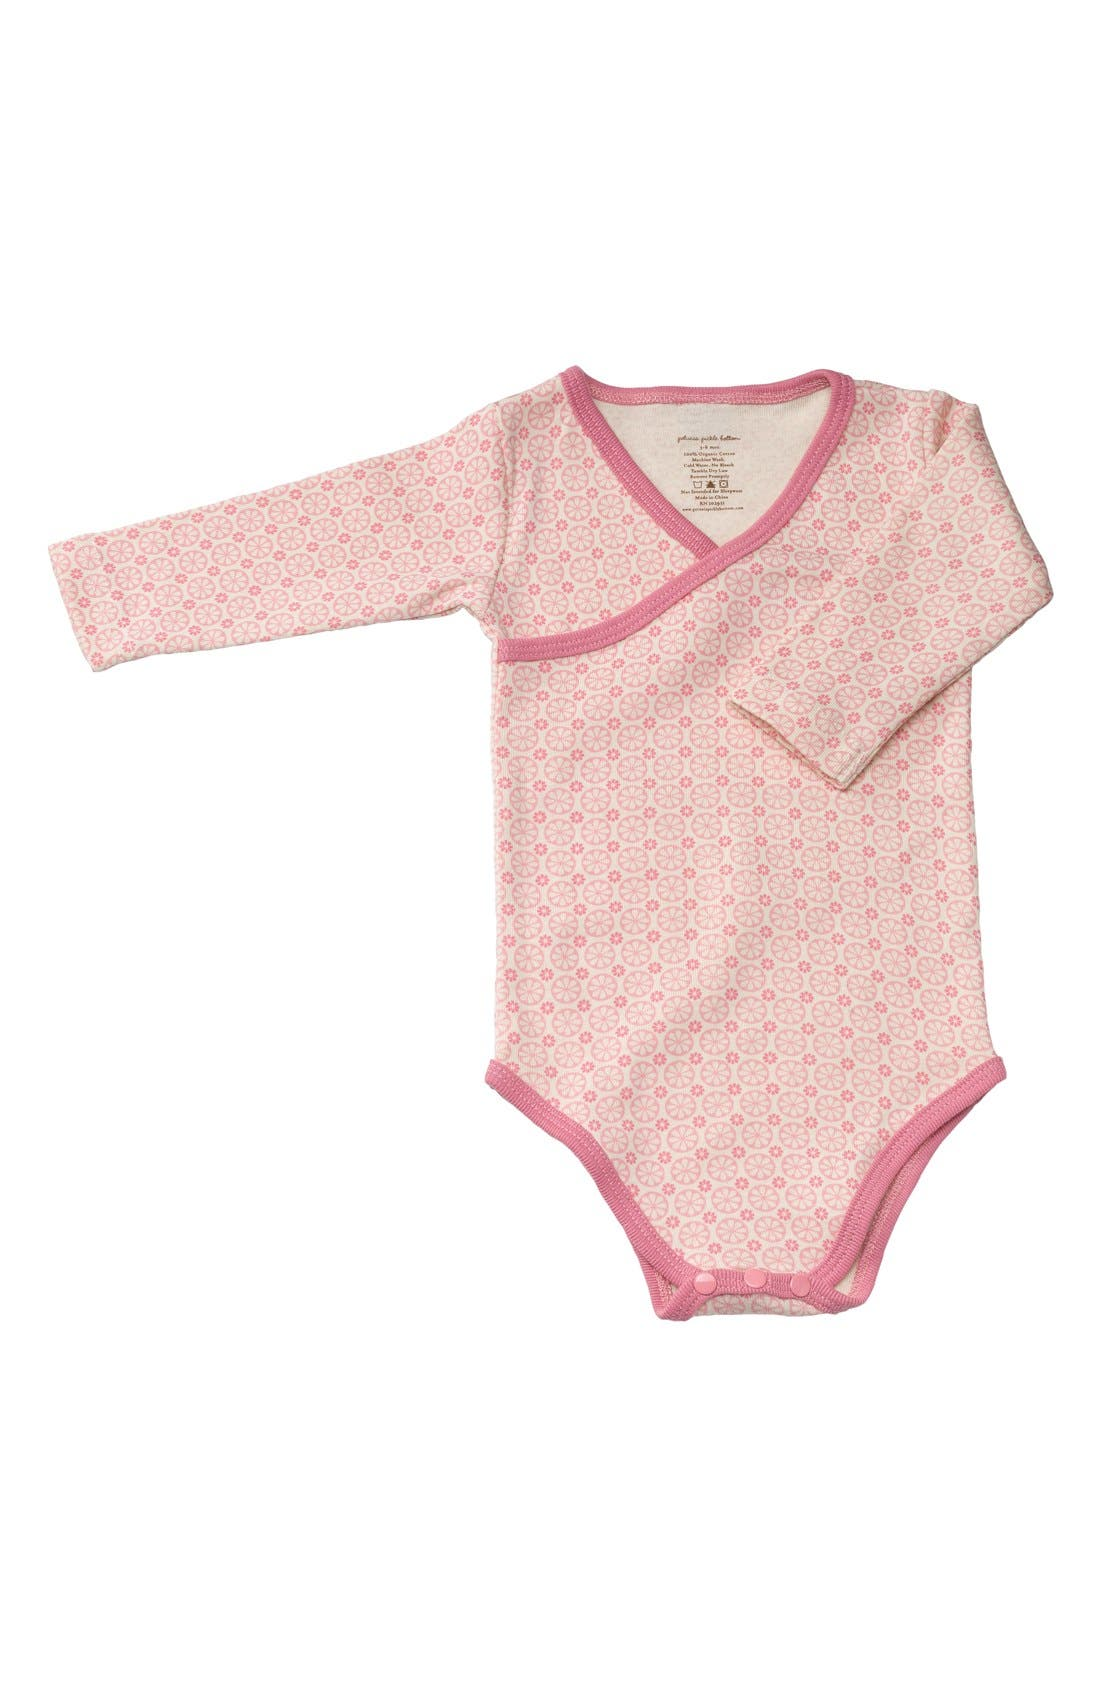 Alternate Image 1 Selected - Petunia Pickle Bottom Organic Cotton Long Sleeve Bodysuit (Baby Girls)